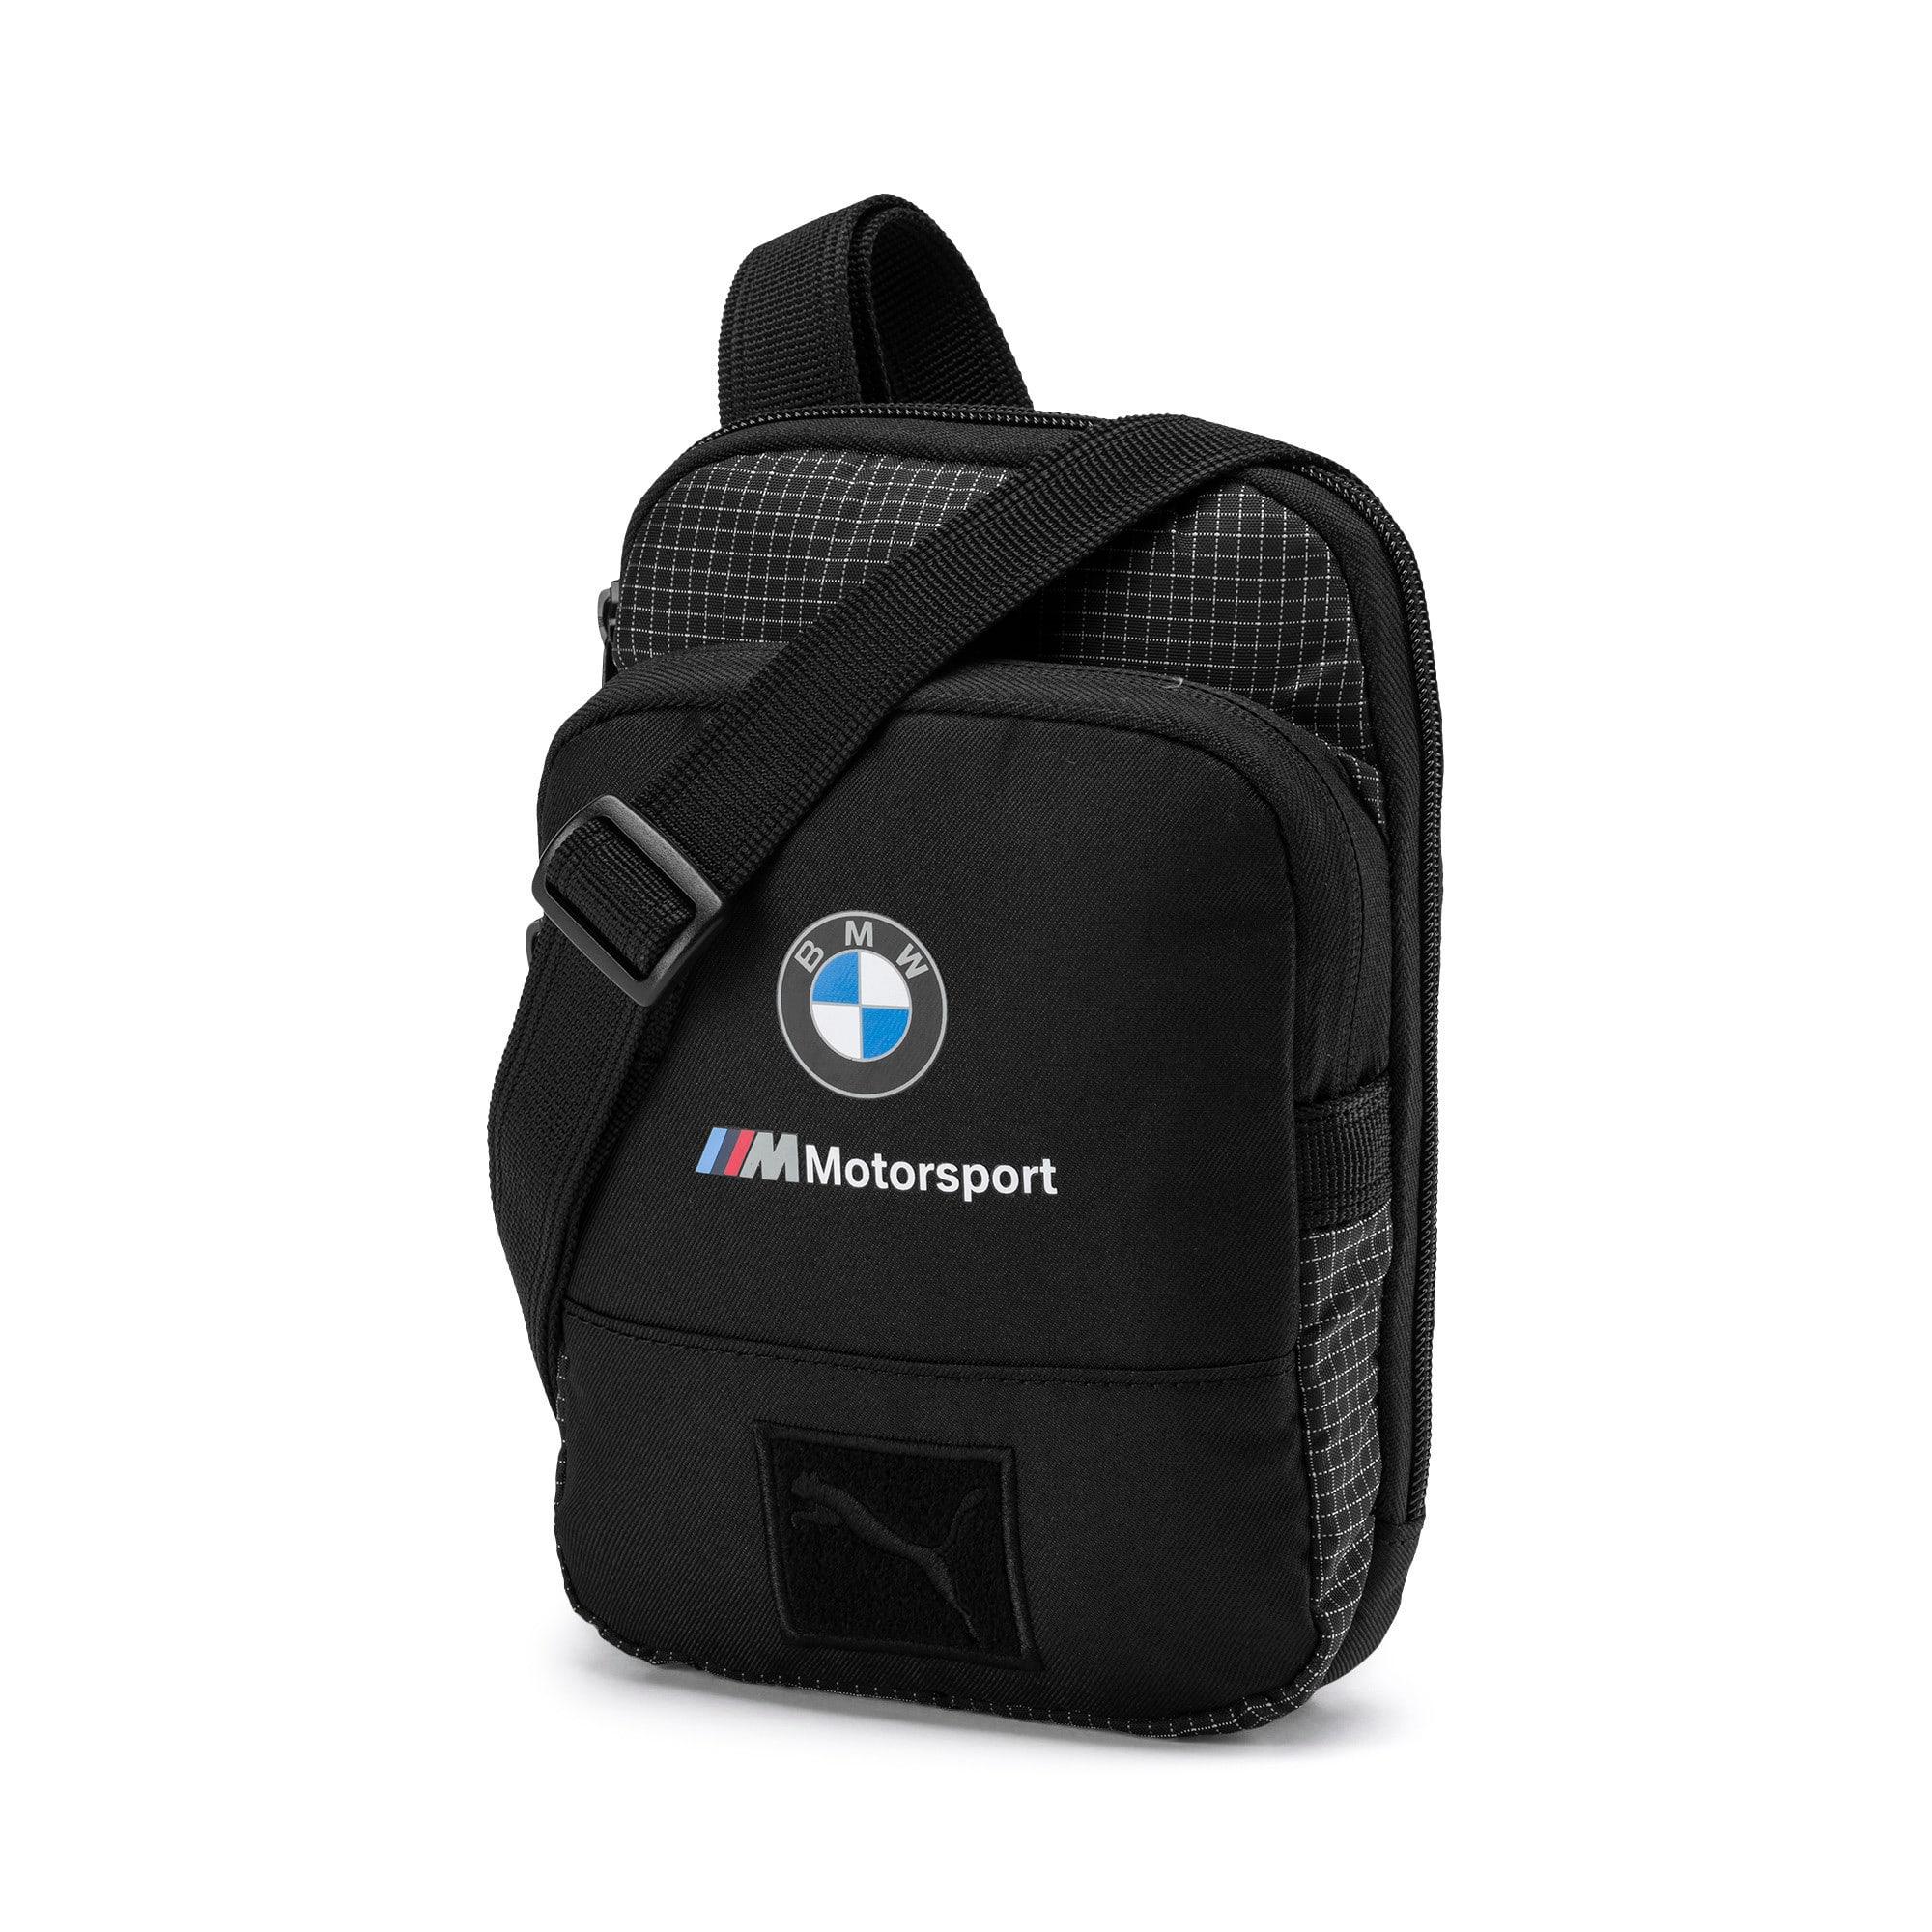 Thumbnail 1 of BMW M Motorsport Small Portable Bag, Puma Black, medium